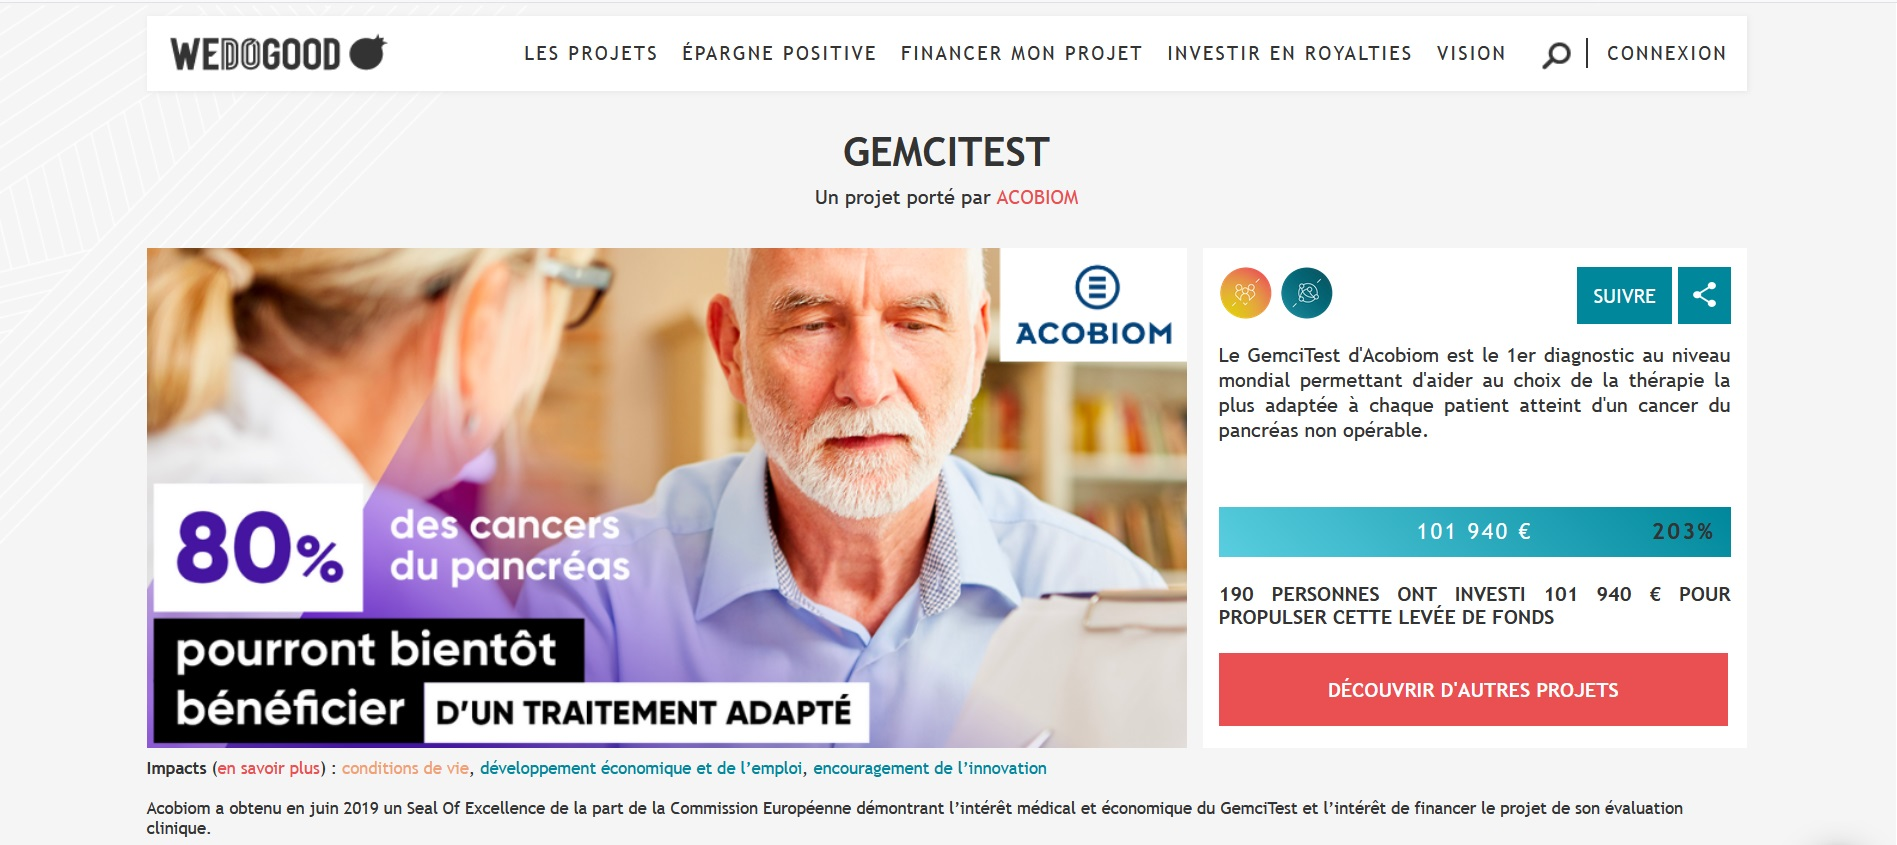 Financing of ACOBIOM's GemciTest on the WEDOGOOD crowdfunding platform